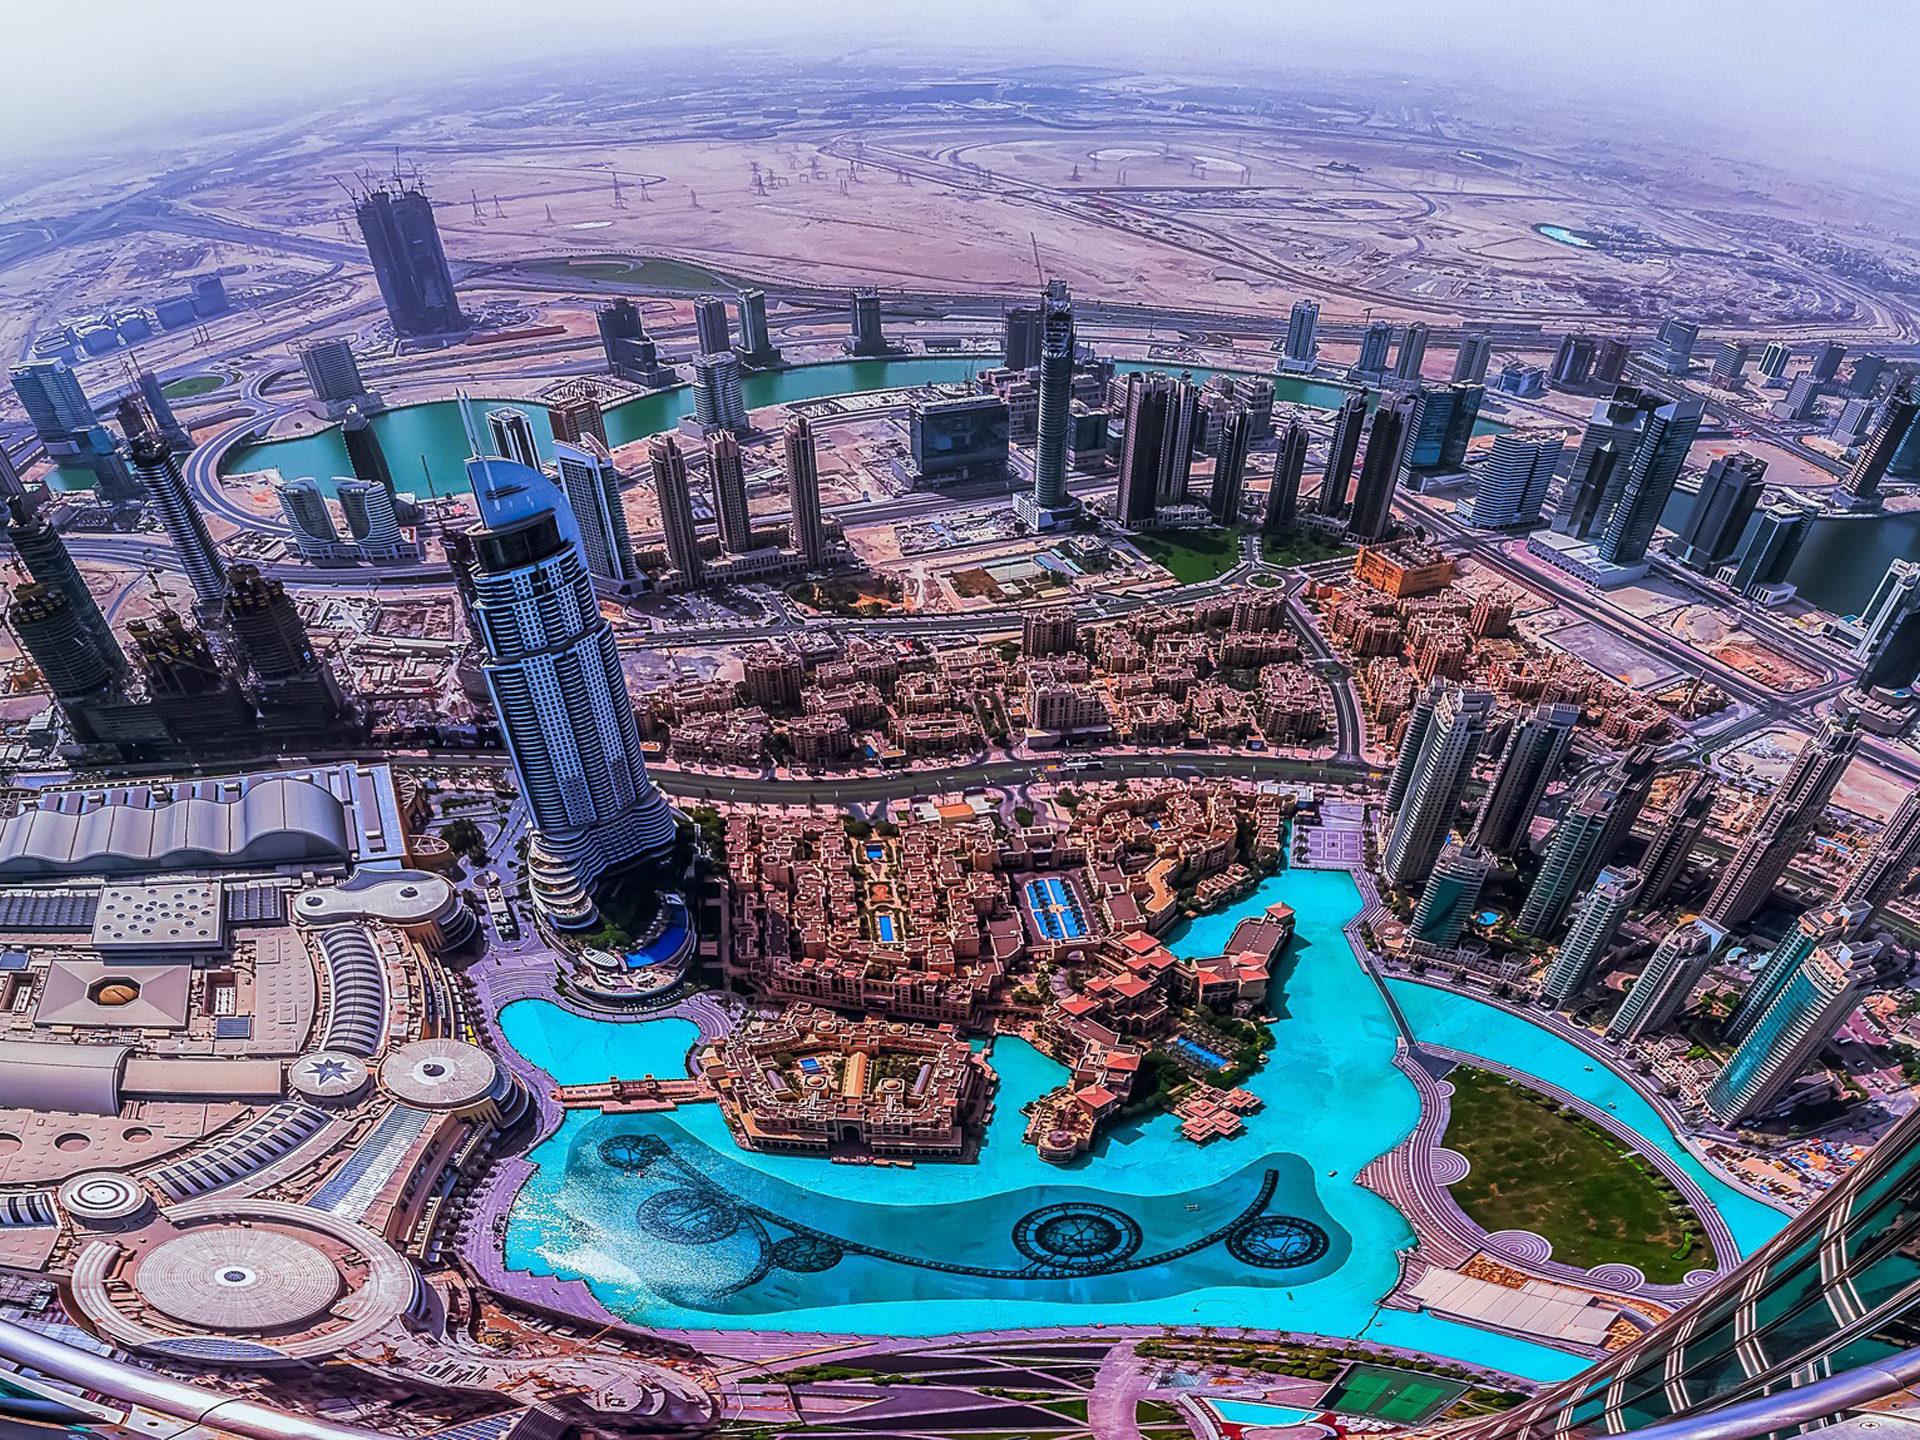 Download Dota 2 Wallpaper Hd Dubai Aerial View From The Top Of Burj Khalifa Desktop Hd